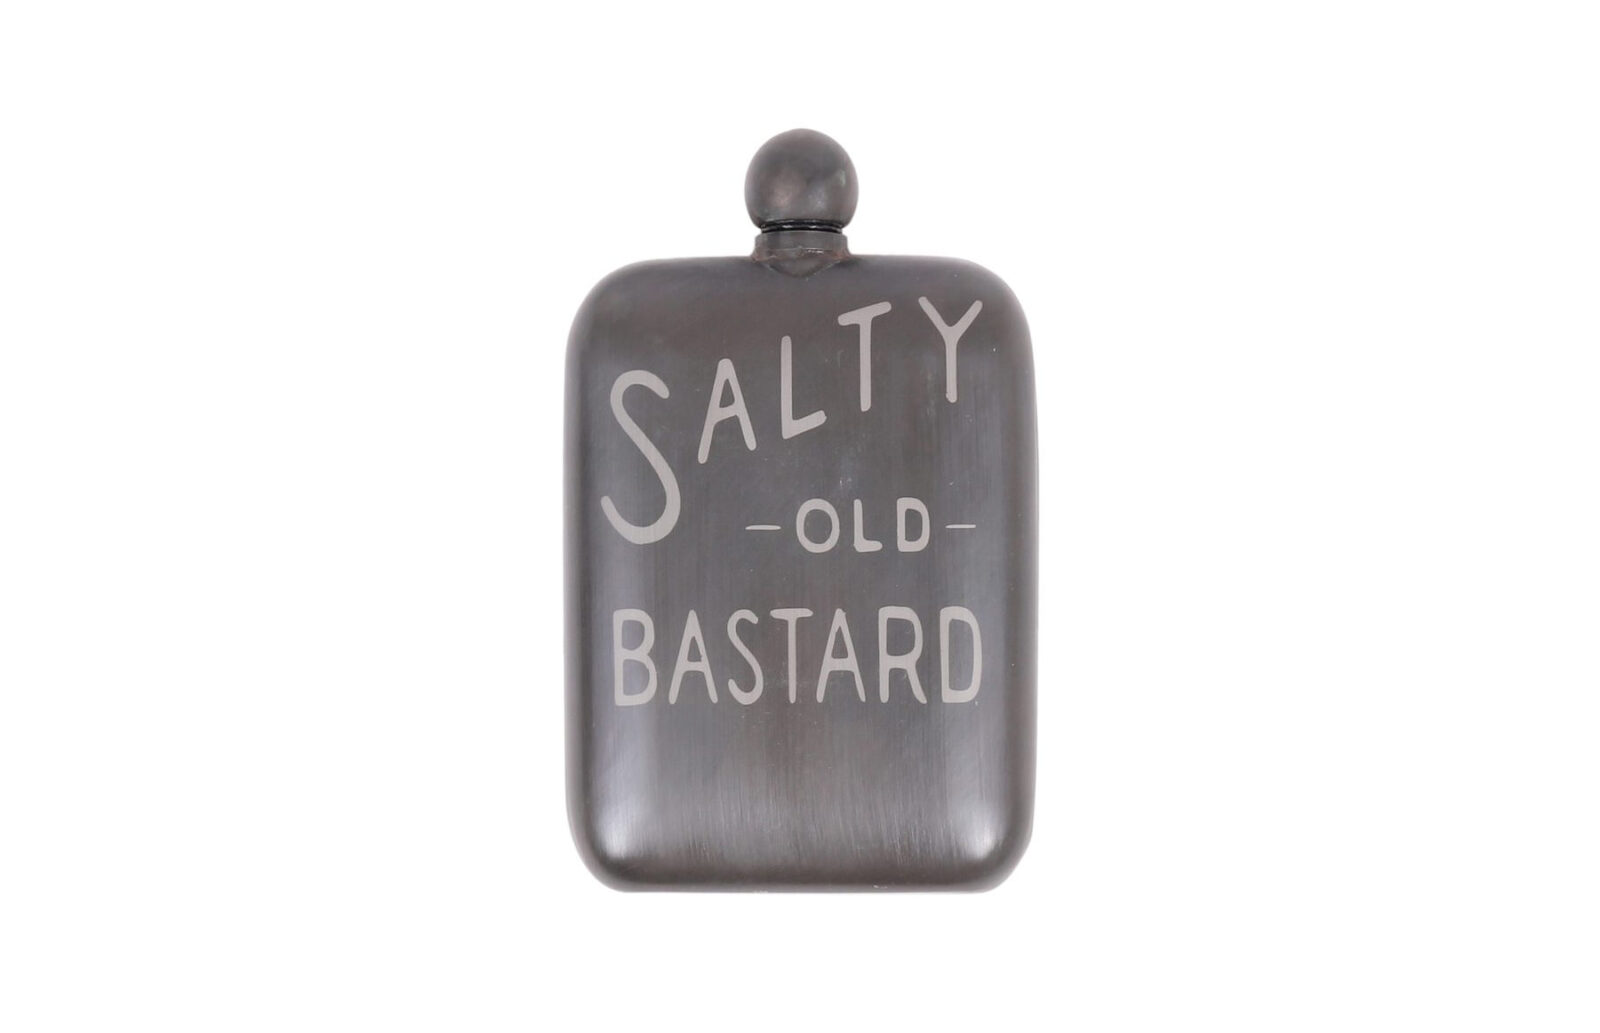 Salty Old Bastard Flask 1600x1033 - Salty Old Bastard Flask